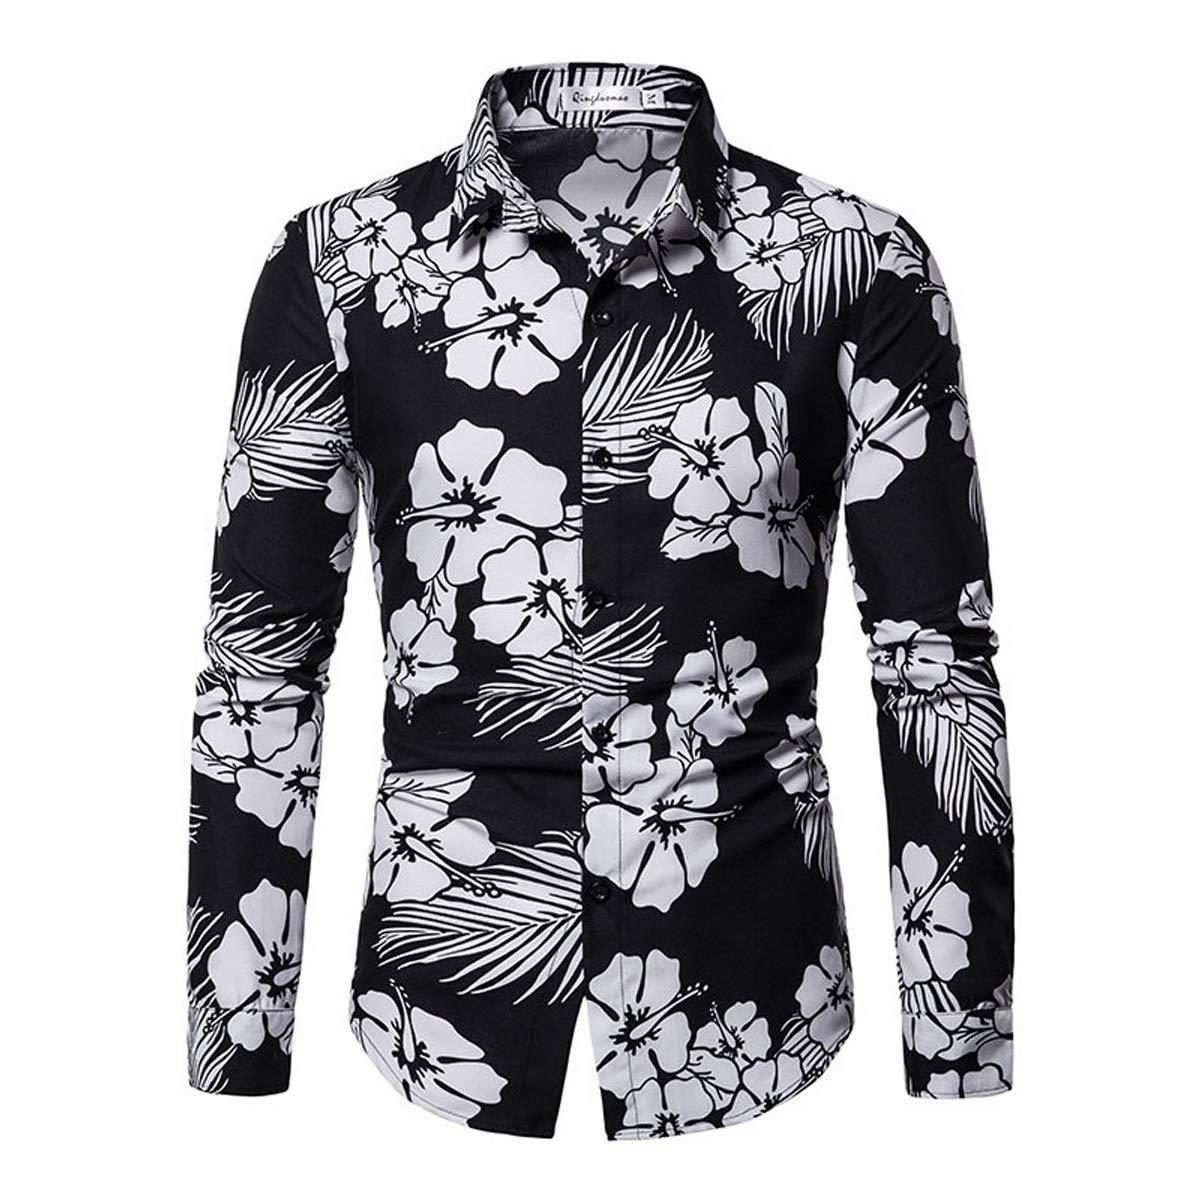 Otto Dobbin Spring Mens Shirt 3D Print Casual Long Sleeve Flower Shirt